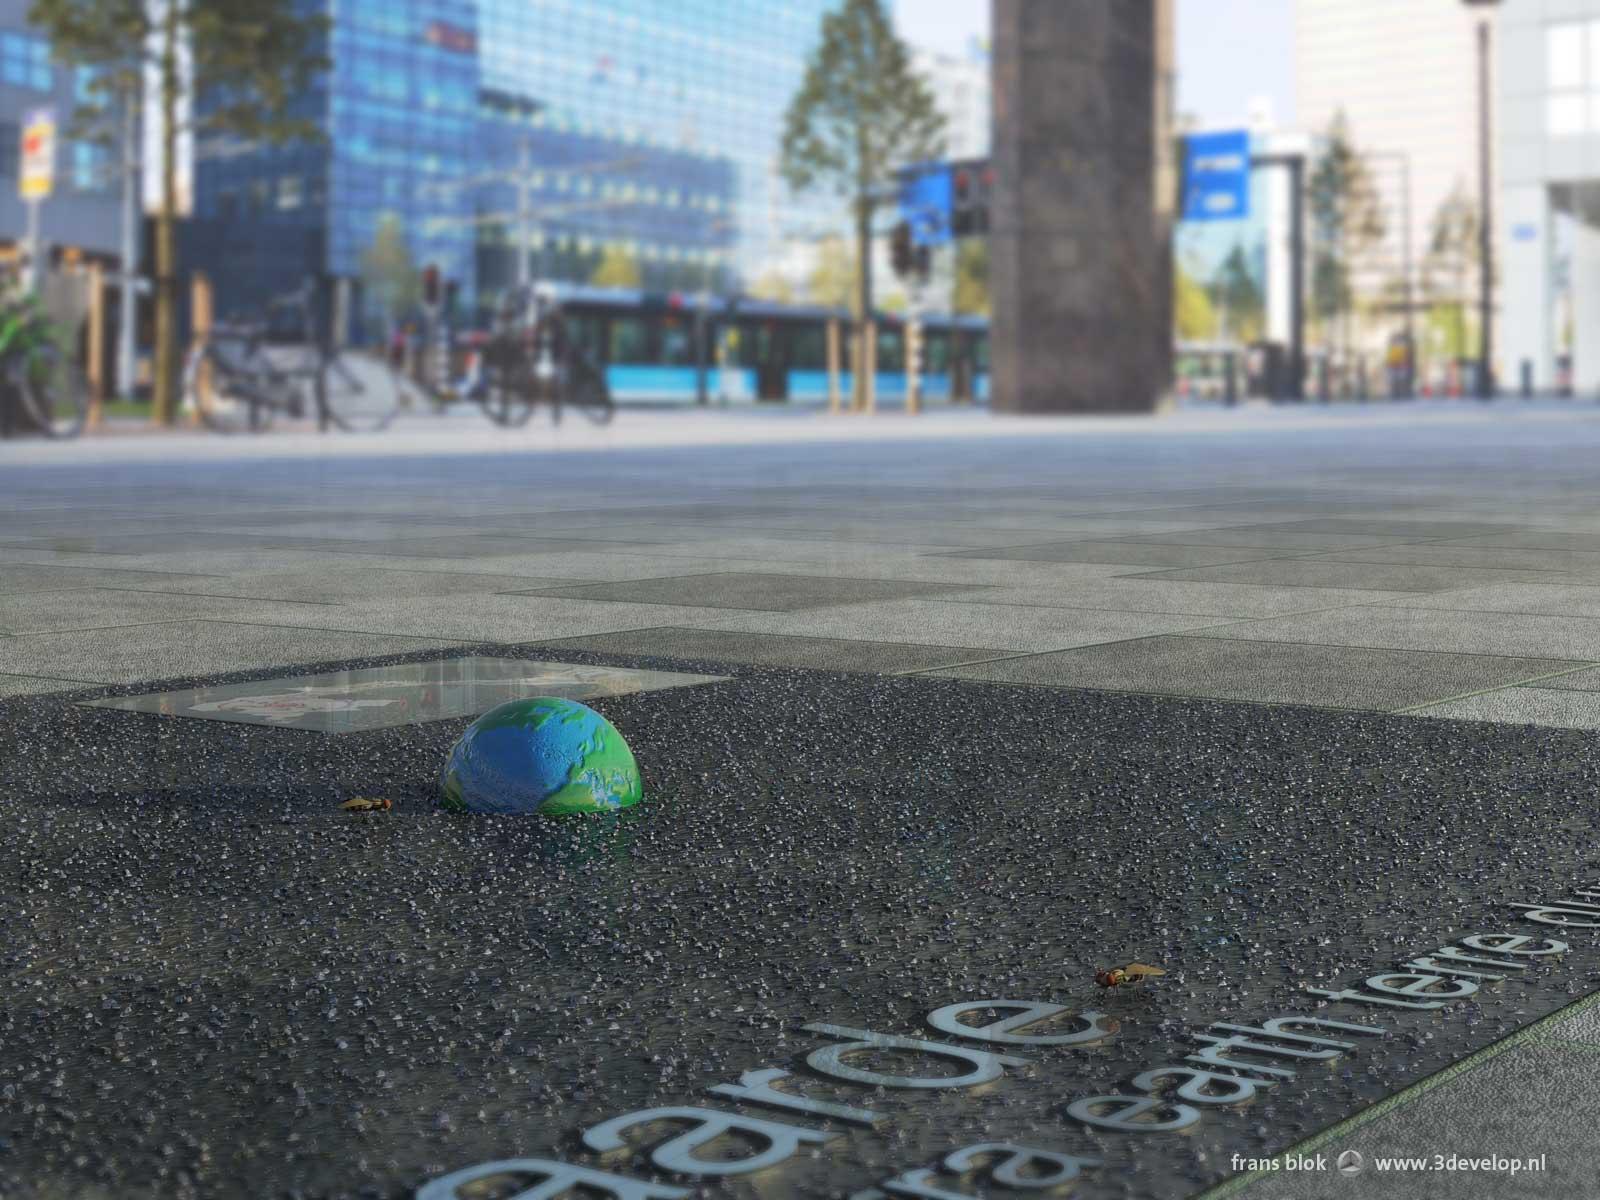 The Earth on Weena boulevard as part of the Rotterdam Streetplanetarium